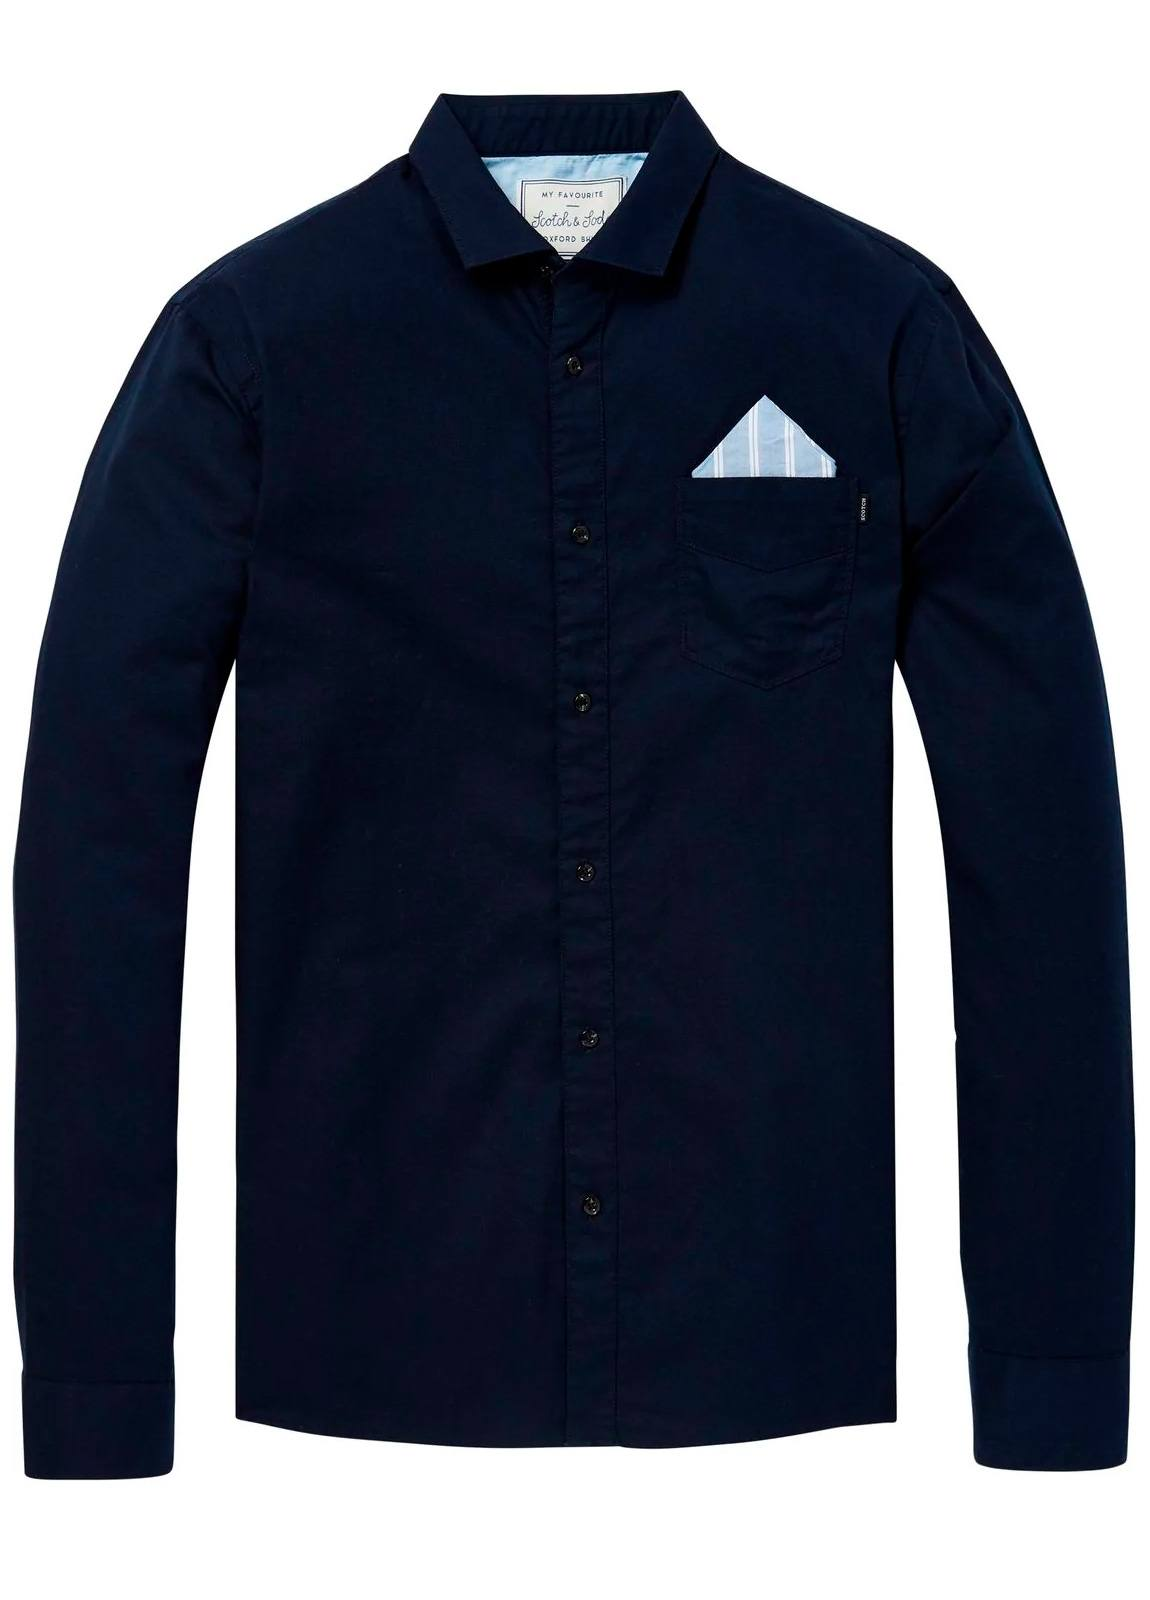 Camisa REGULAR FIT, cuello clasico, bolsillo pecho con pañuelo. Tejido oxford, lisa, color azul marino . 100% Algodón.